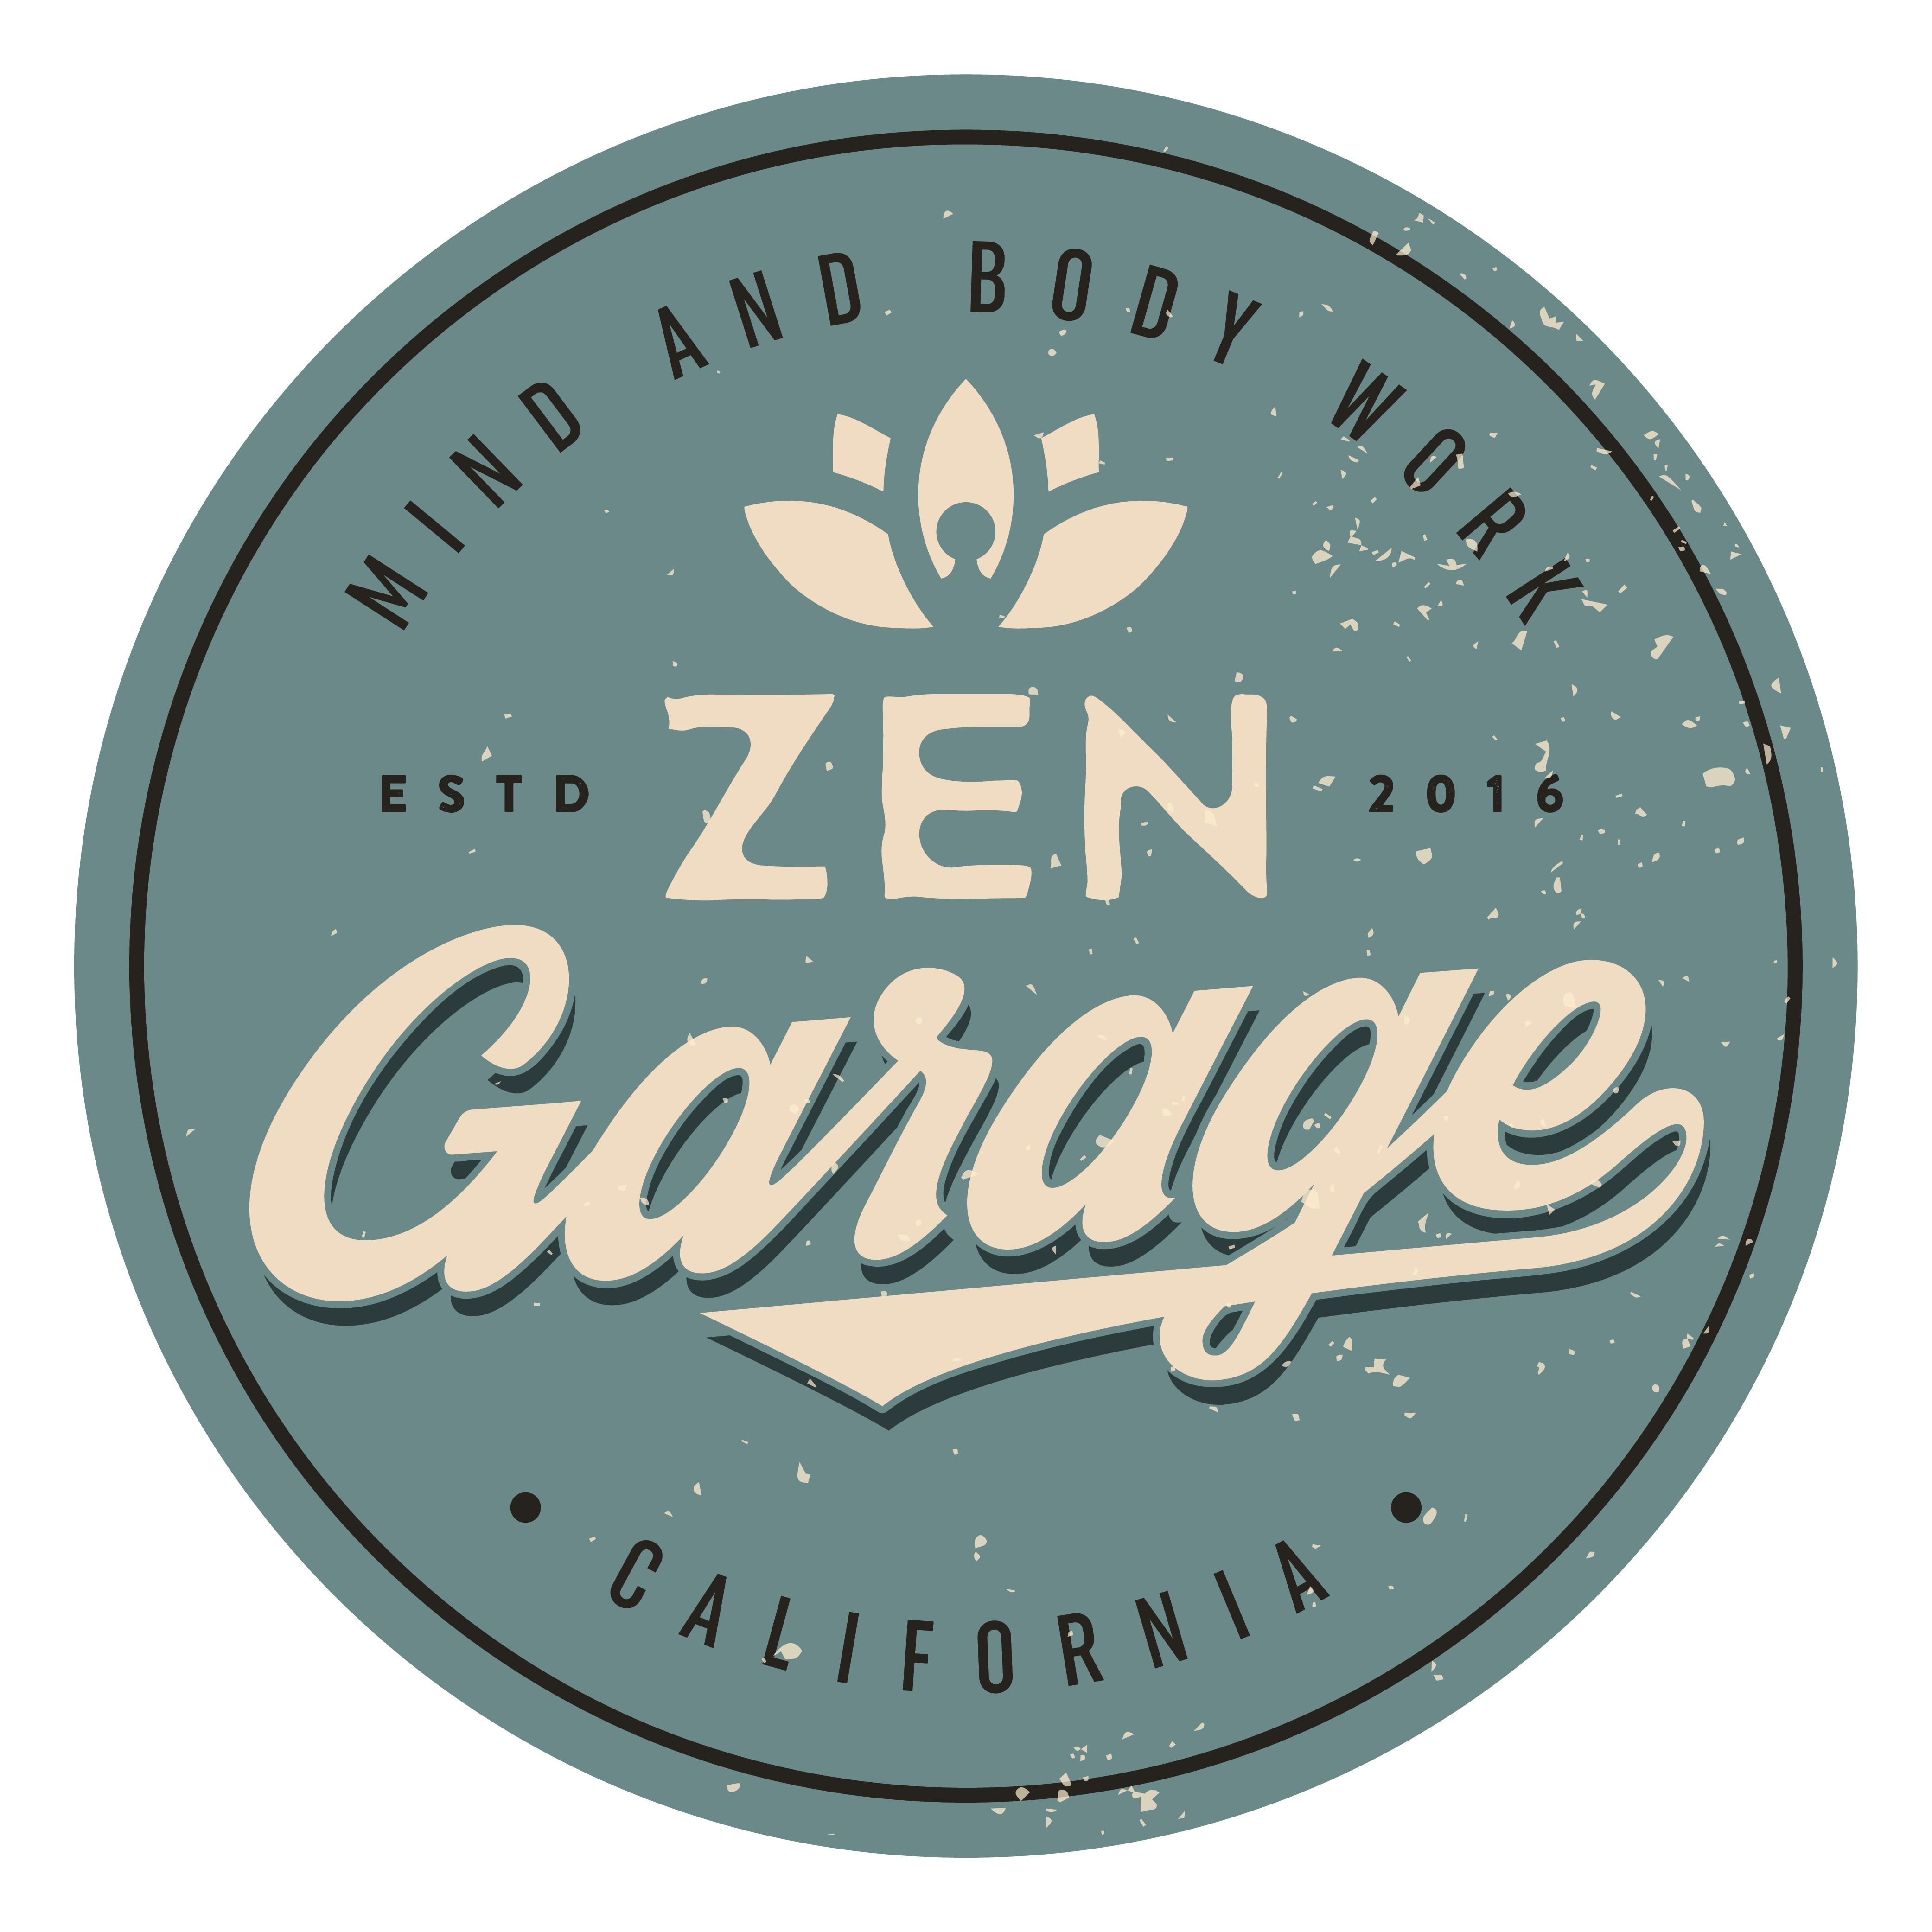 Vinatge/industrial logo wanted for yoga studio